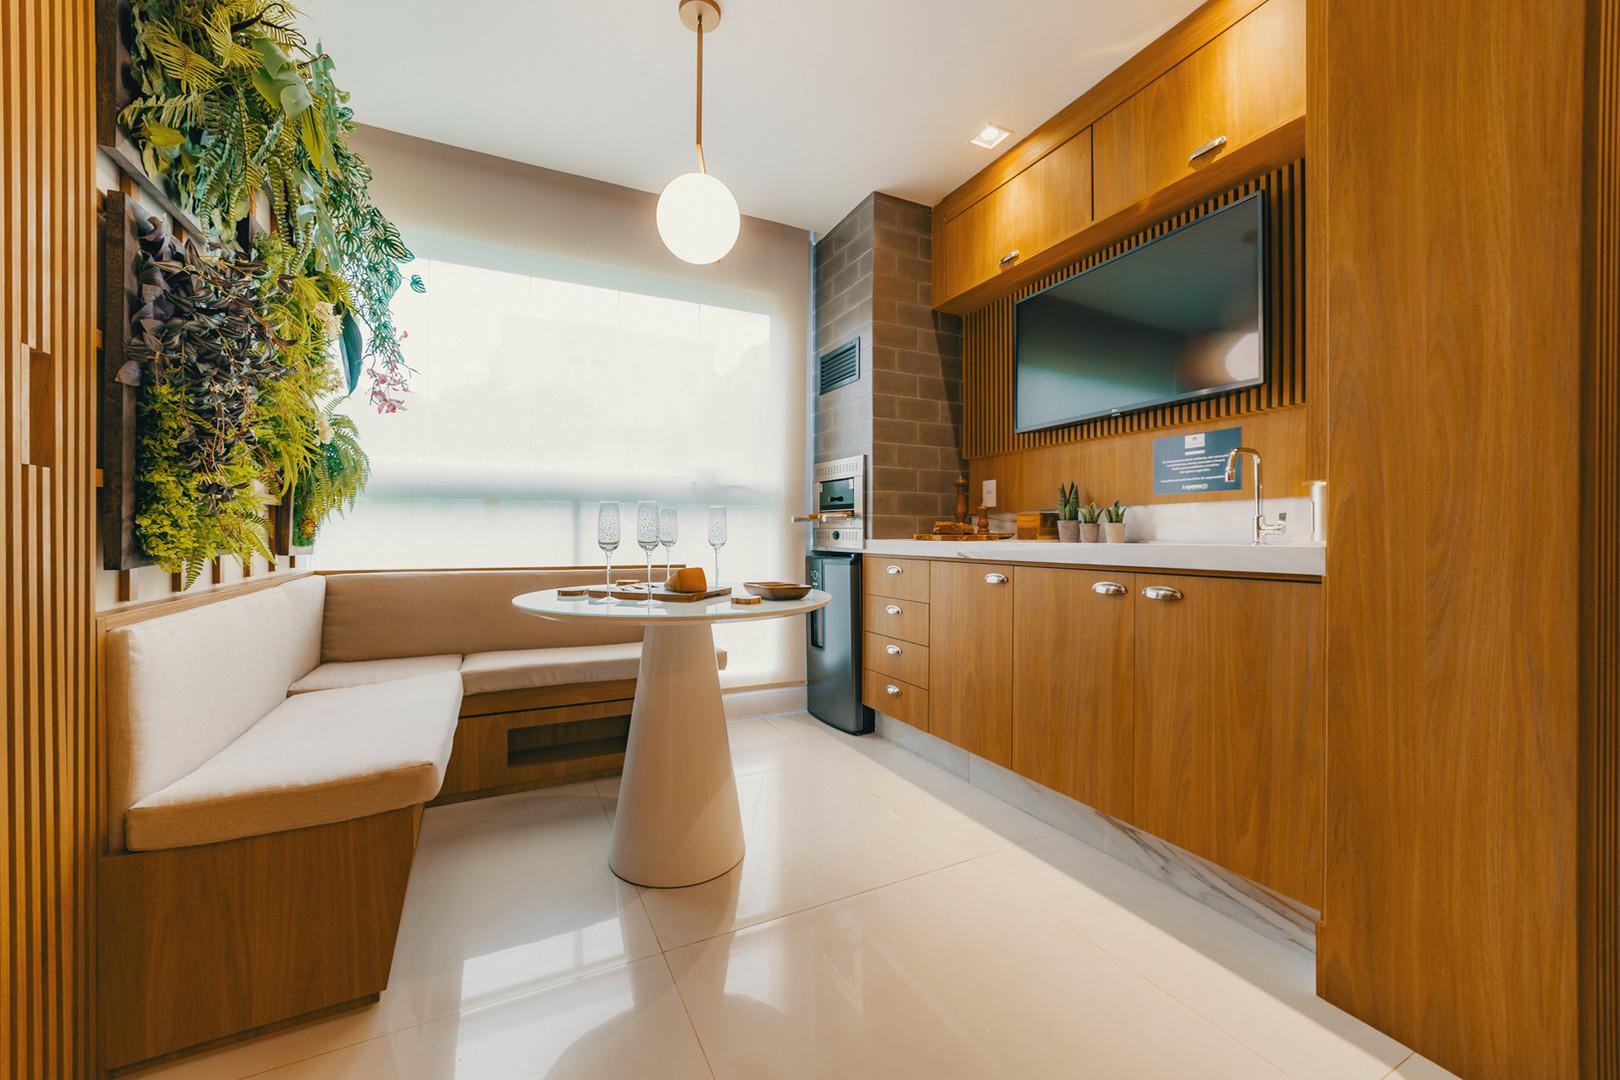 018 - Lupema - Terrace Residence - 08-01